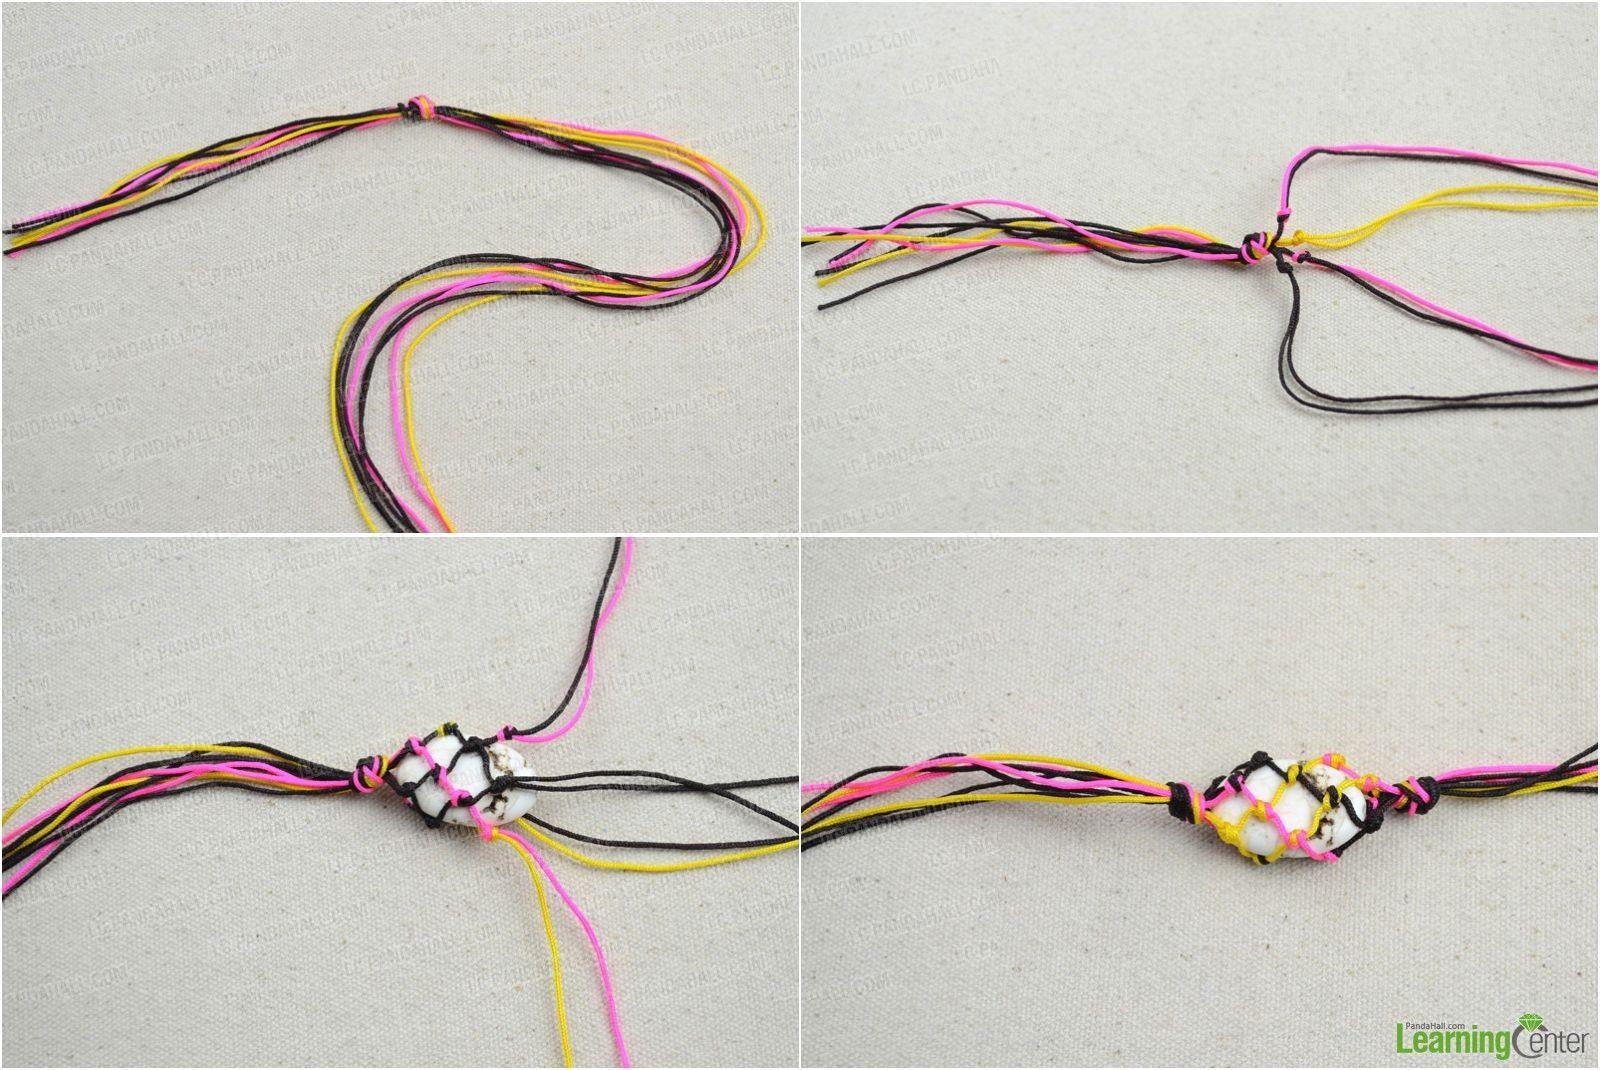 Perfect Wire Jig Patterns Inspiration - Wiring Schematics and ...